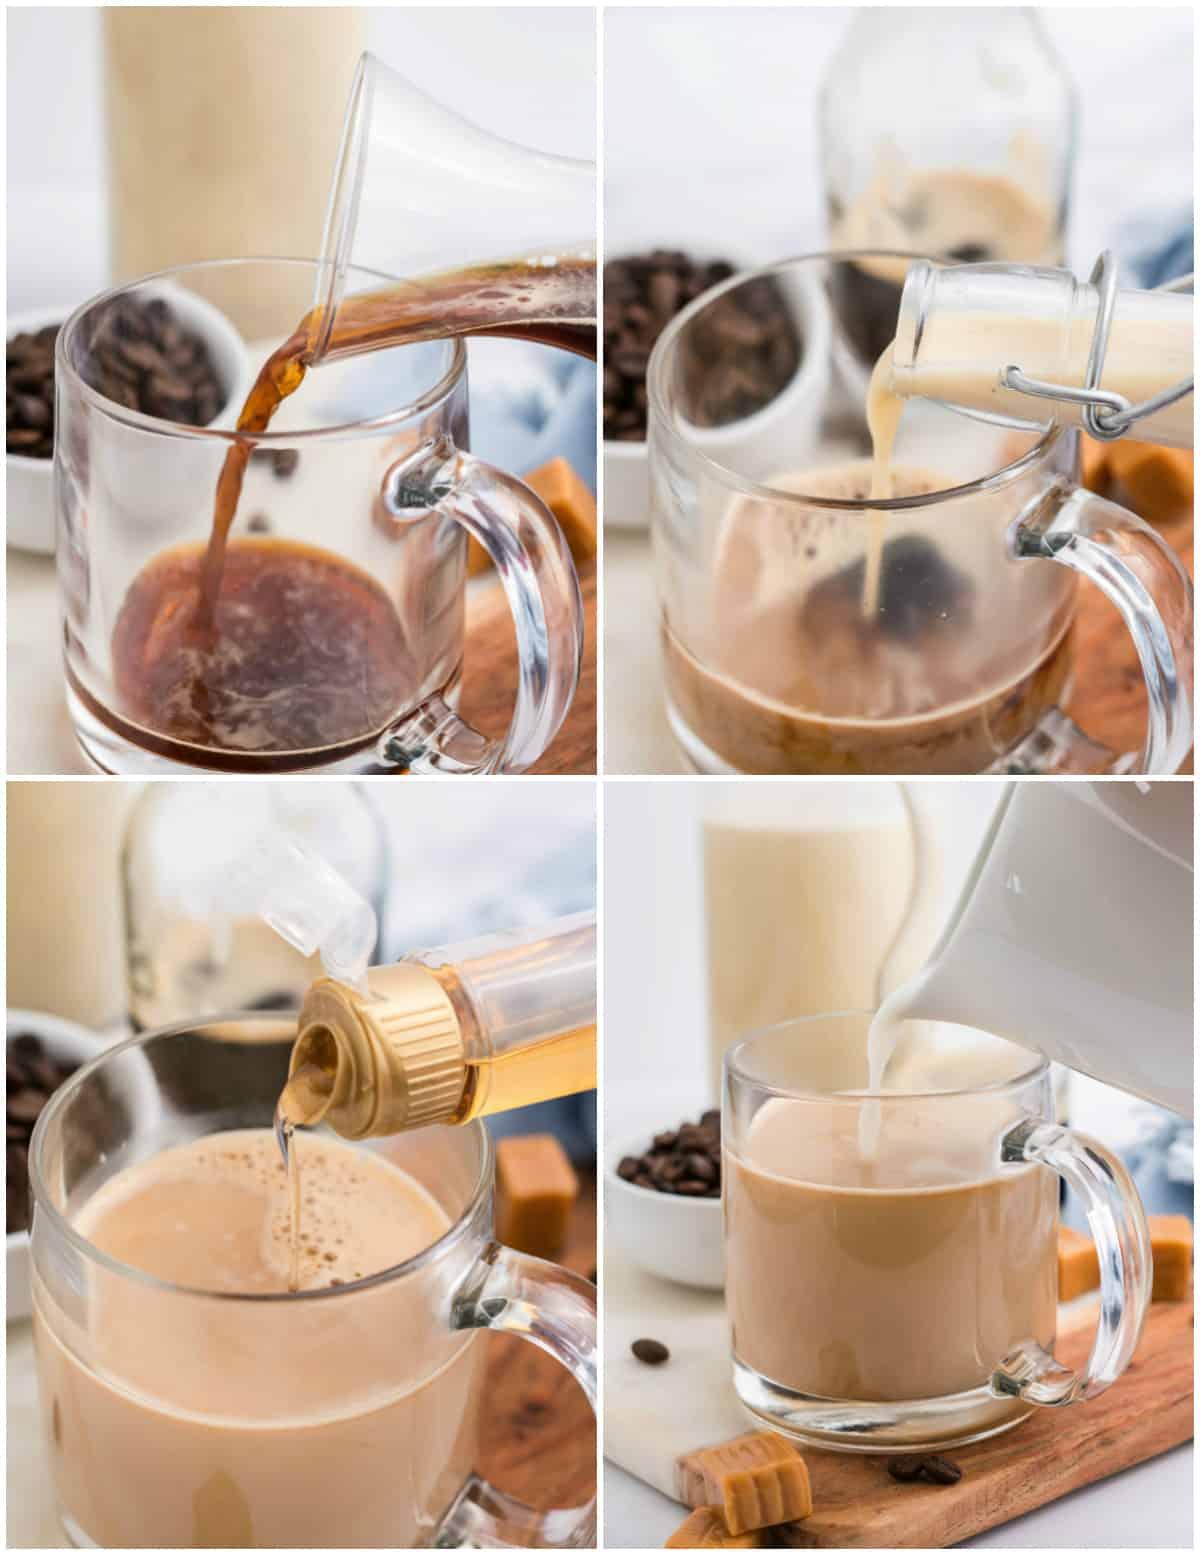 Step by step photos on how to make a Caramel Eggnog Latte